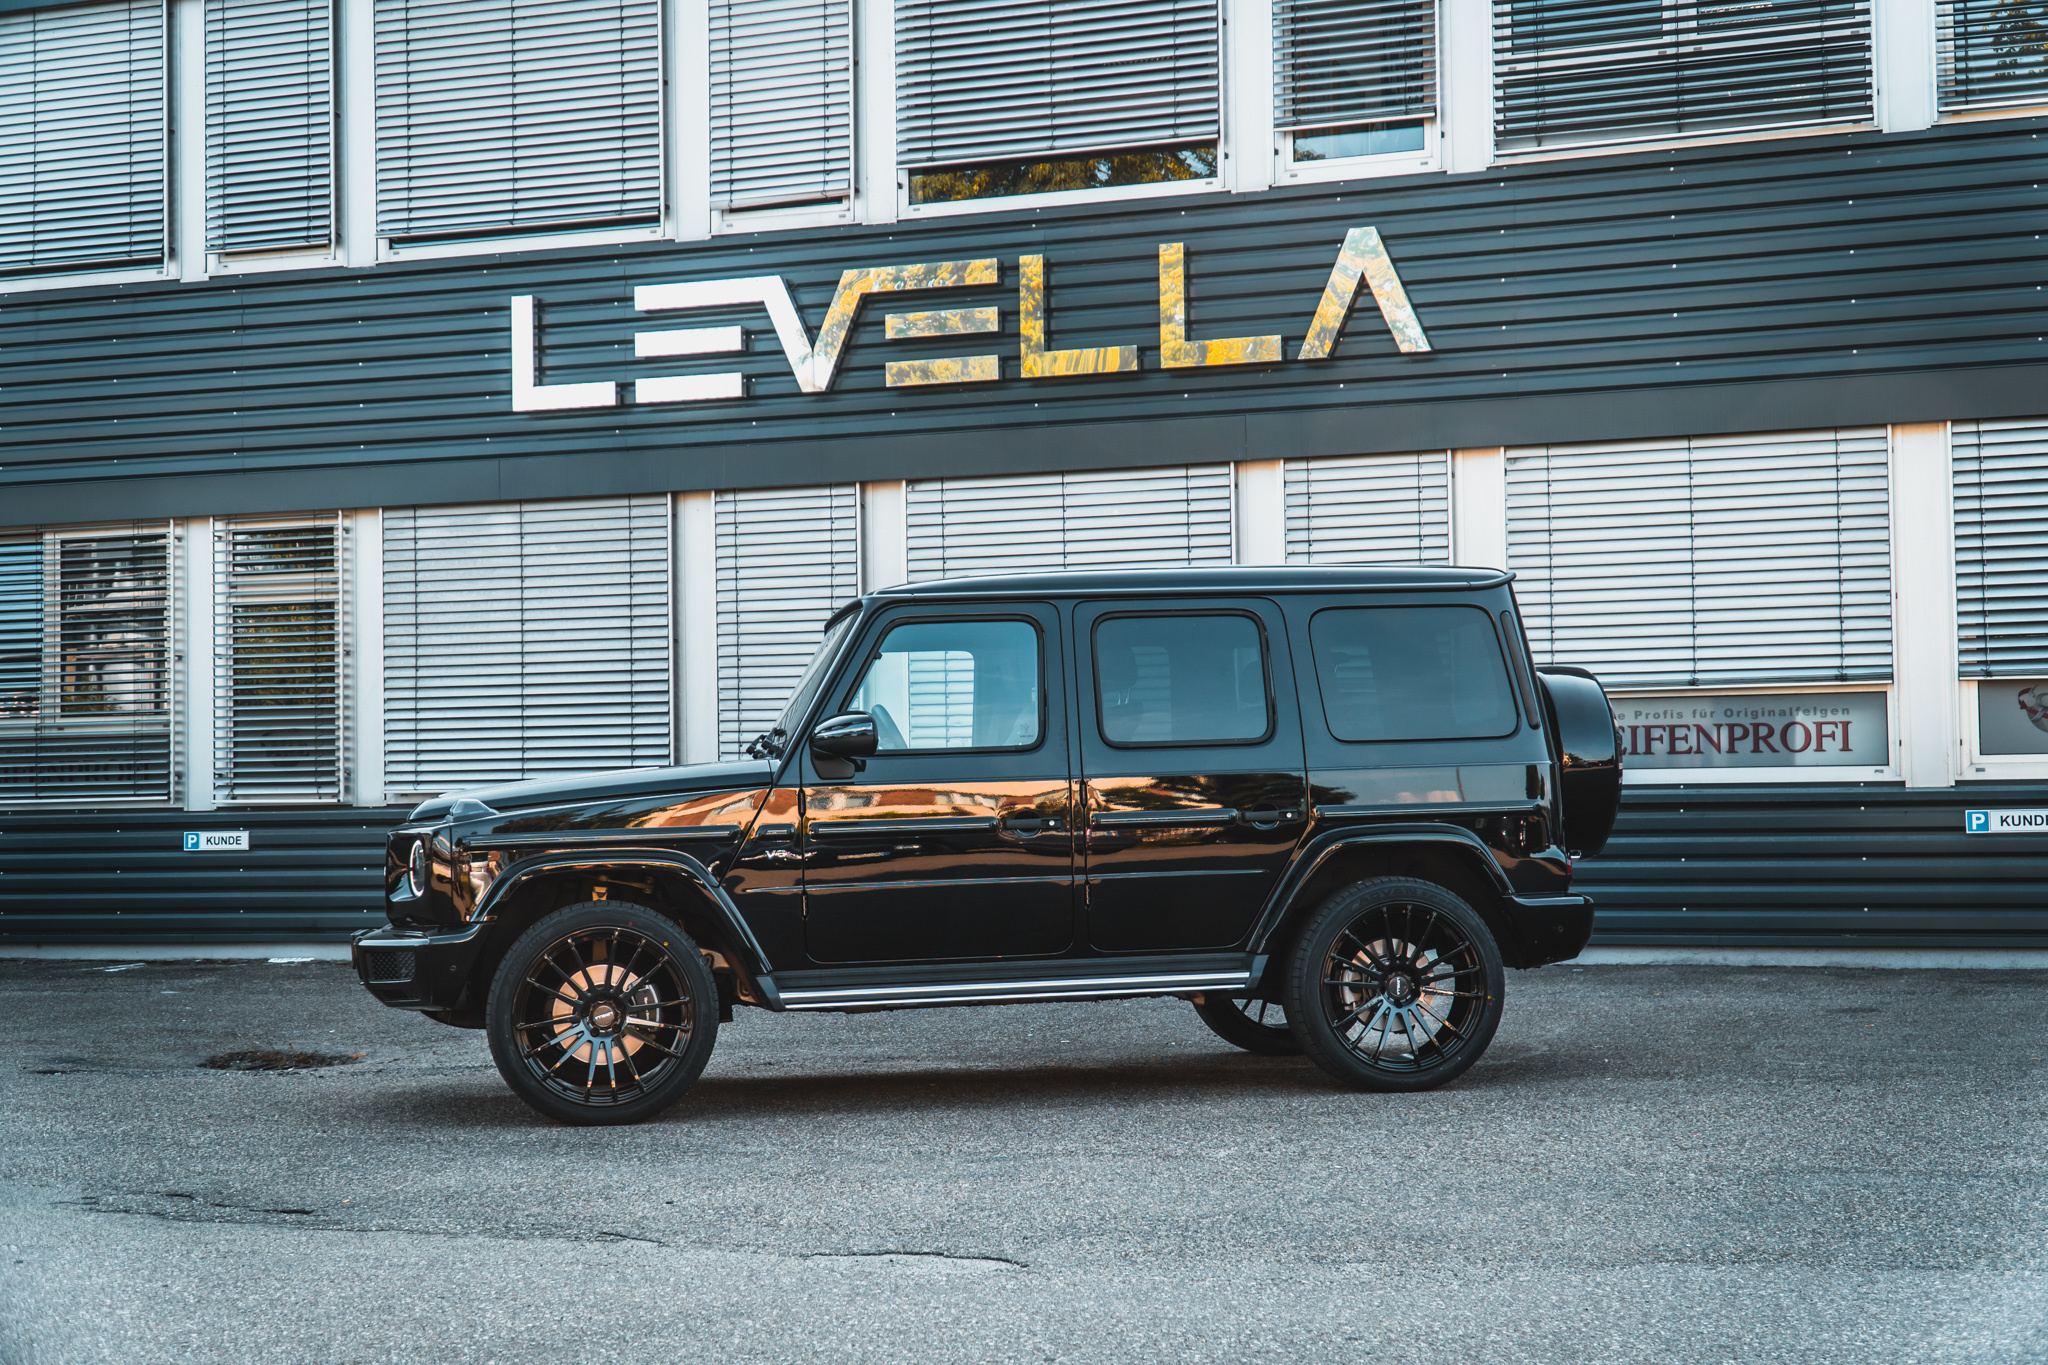 Levella  FORGED |  9,5 x 22 - 11 x 22    TGA / Festigkeit.